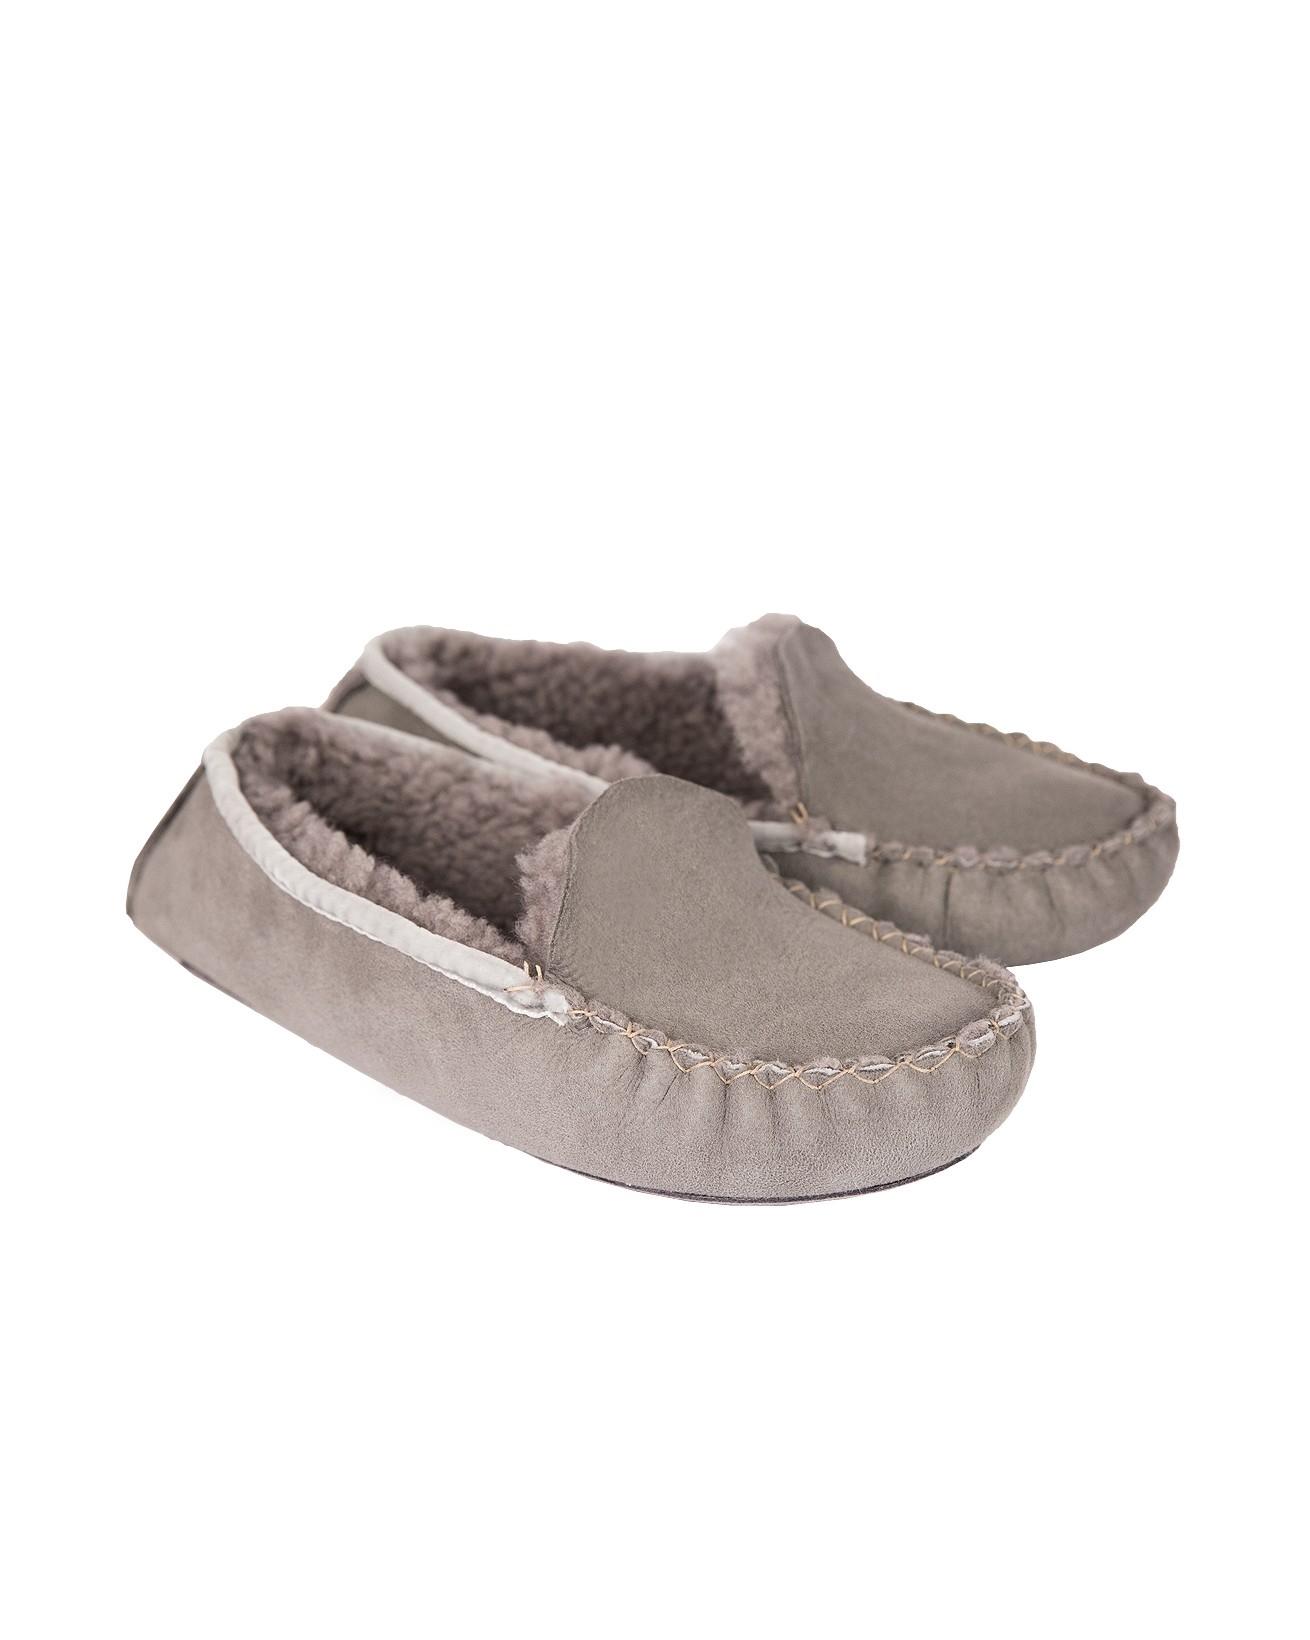 Dena Moccasins - Size 7 - Grey - 597